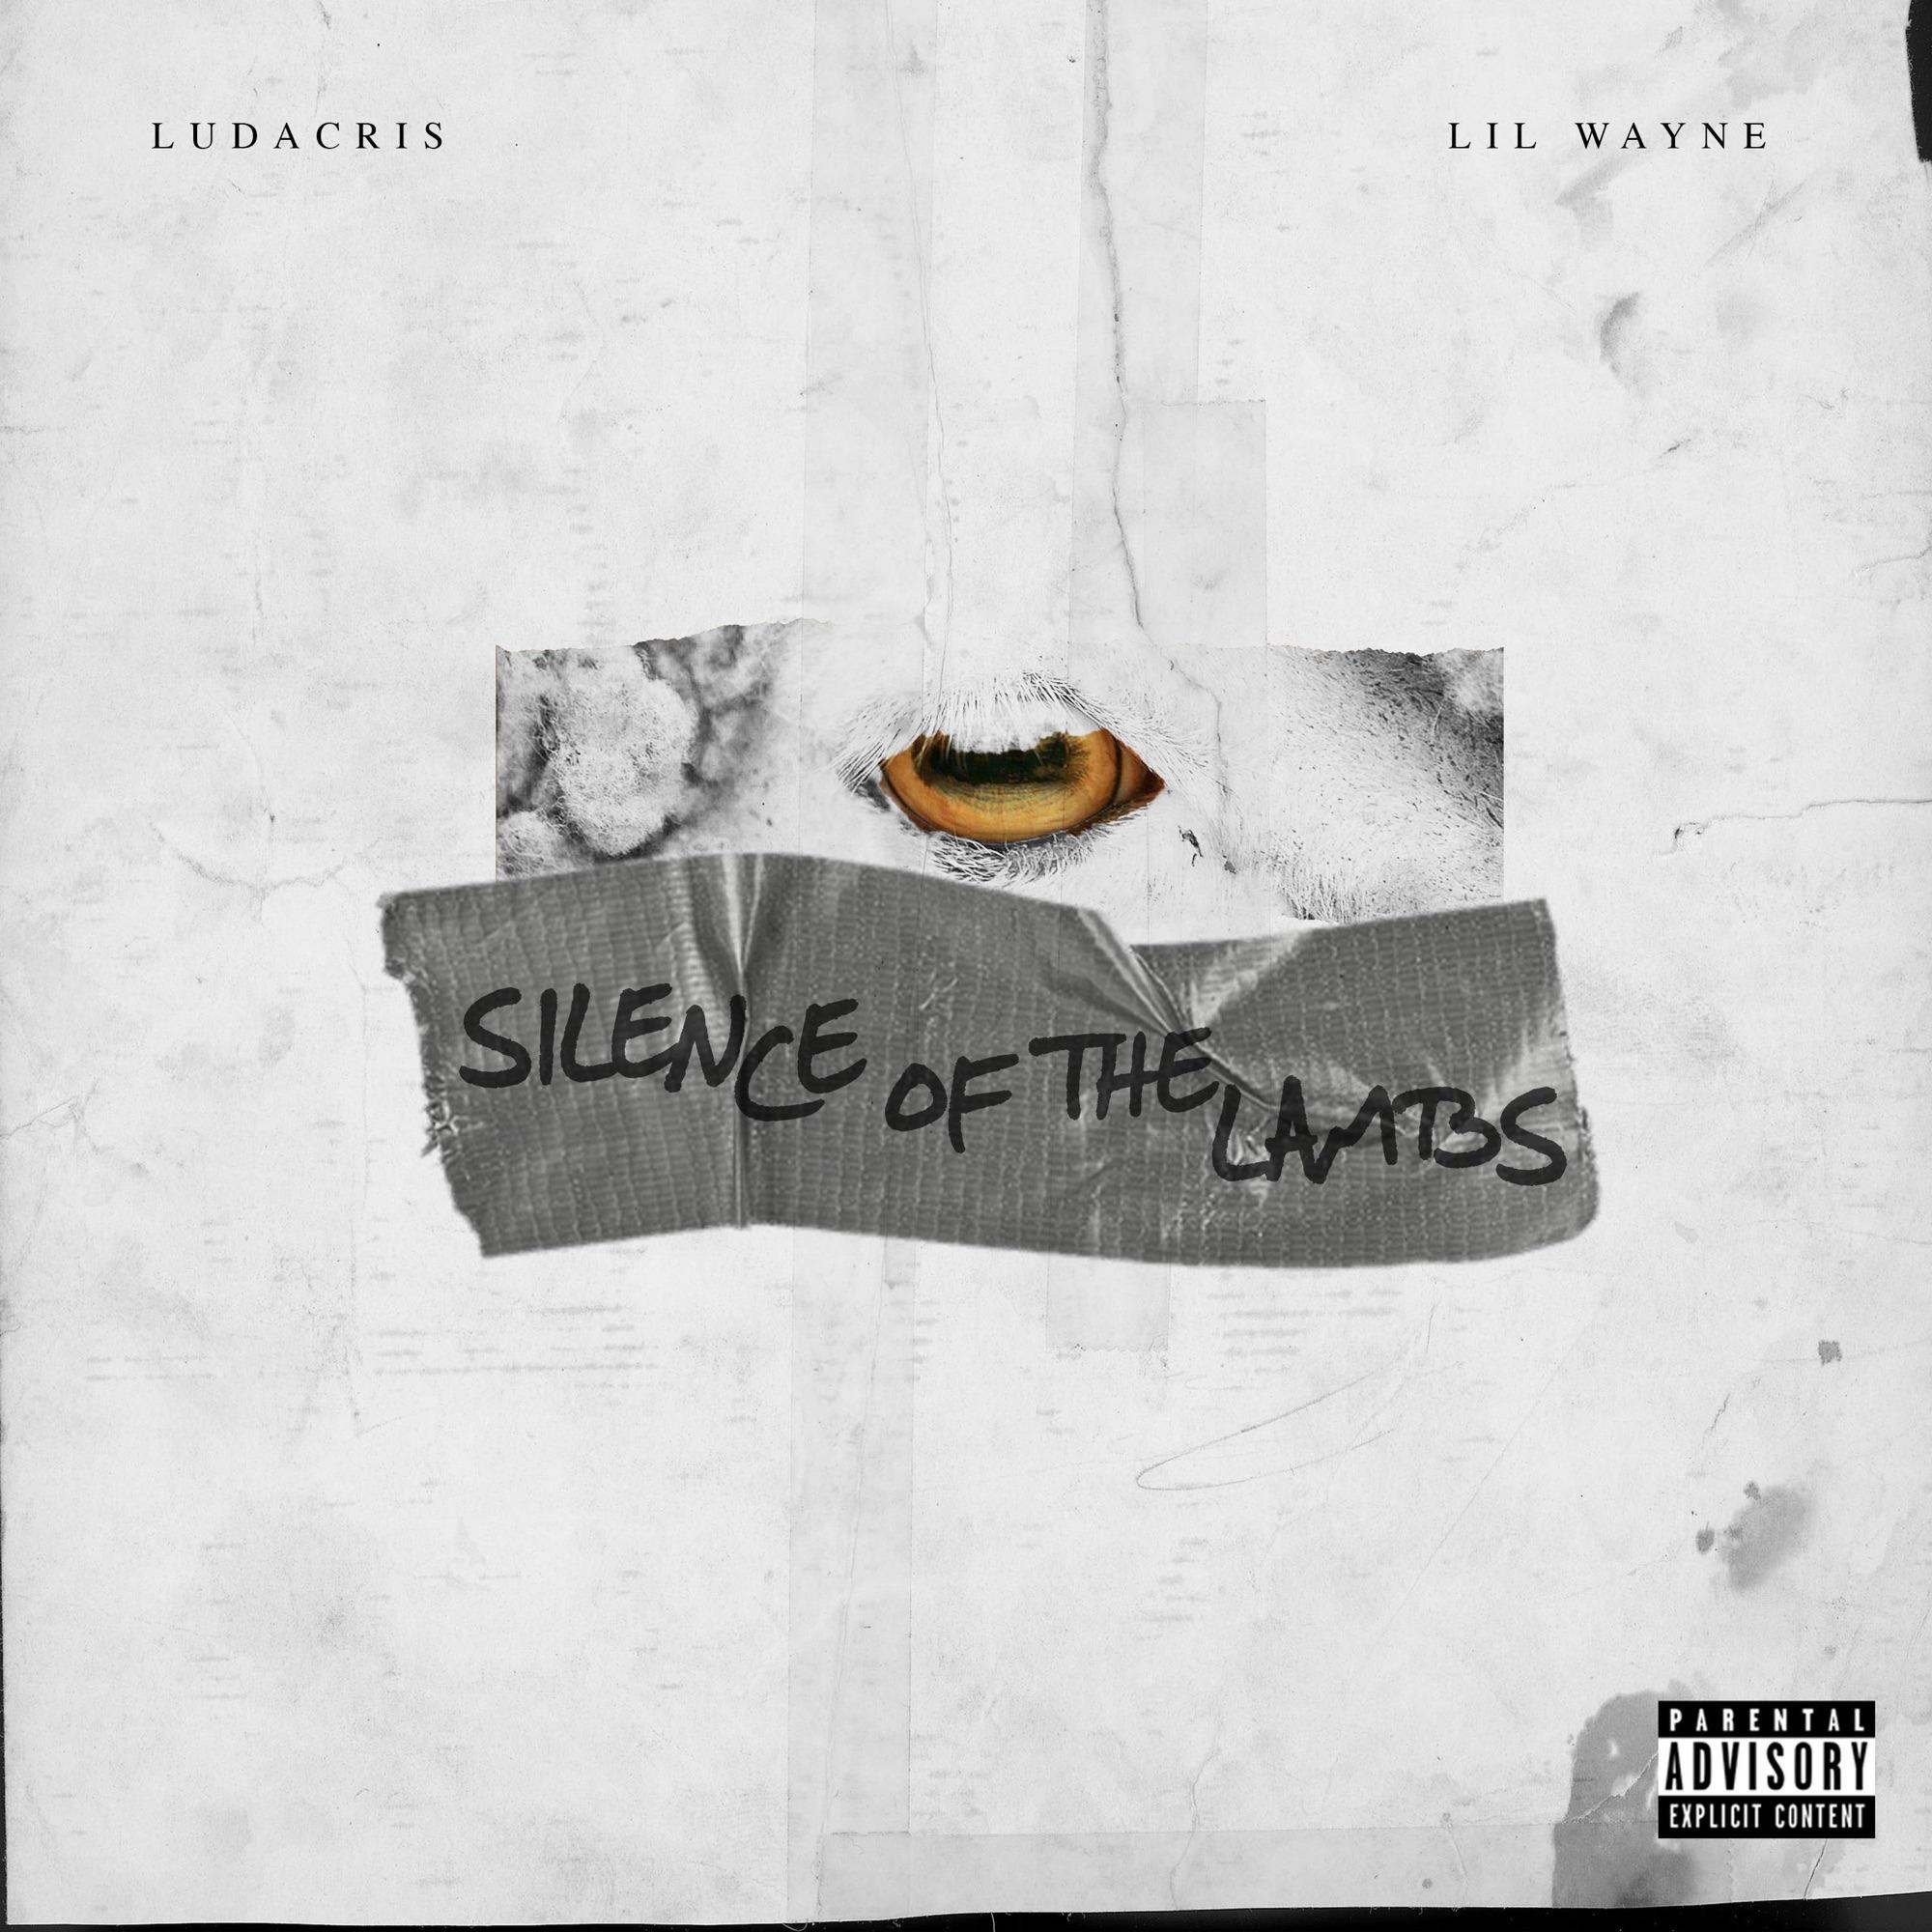 Ludacris Ft. Lil Wayne - S.O.T.L. (Silence of the Lambs)